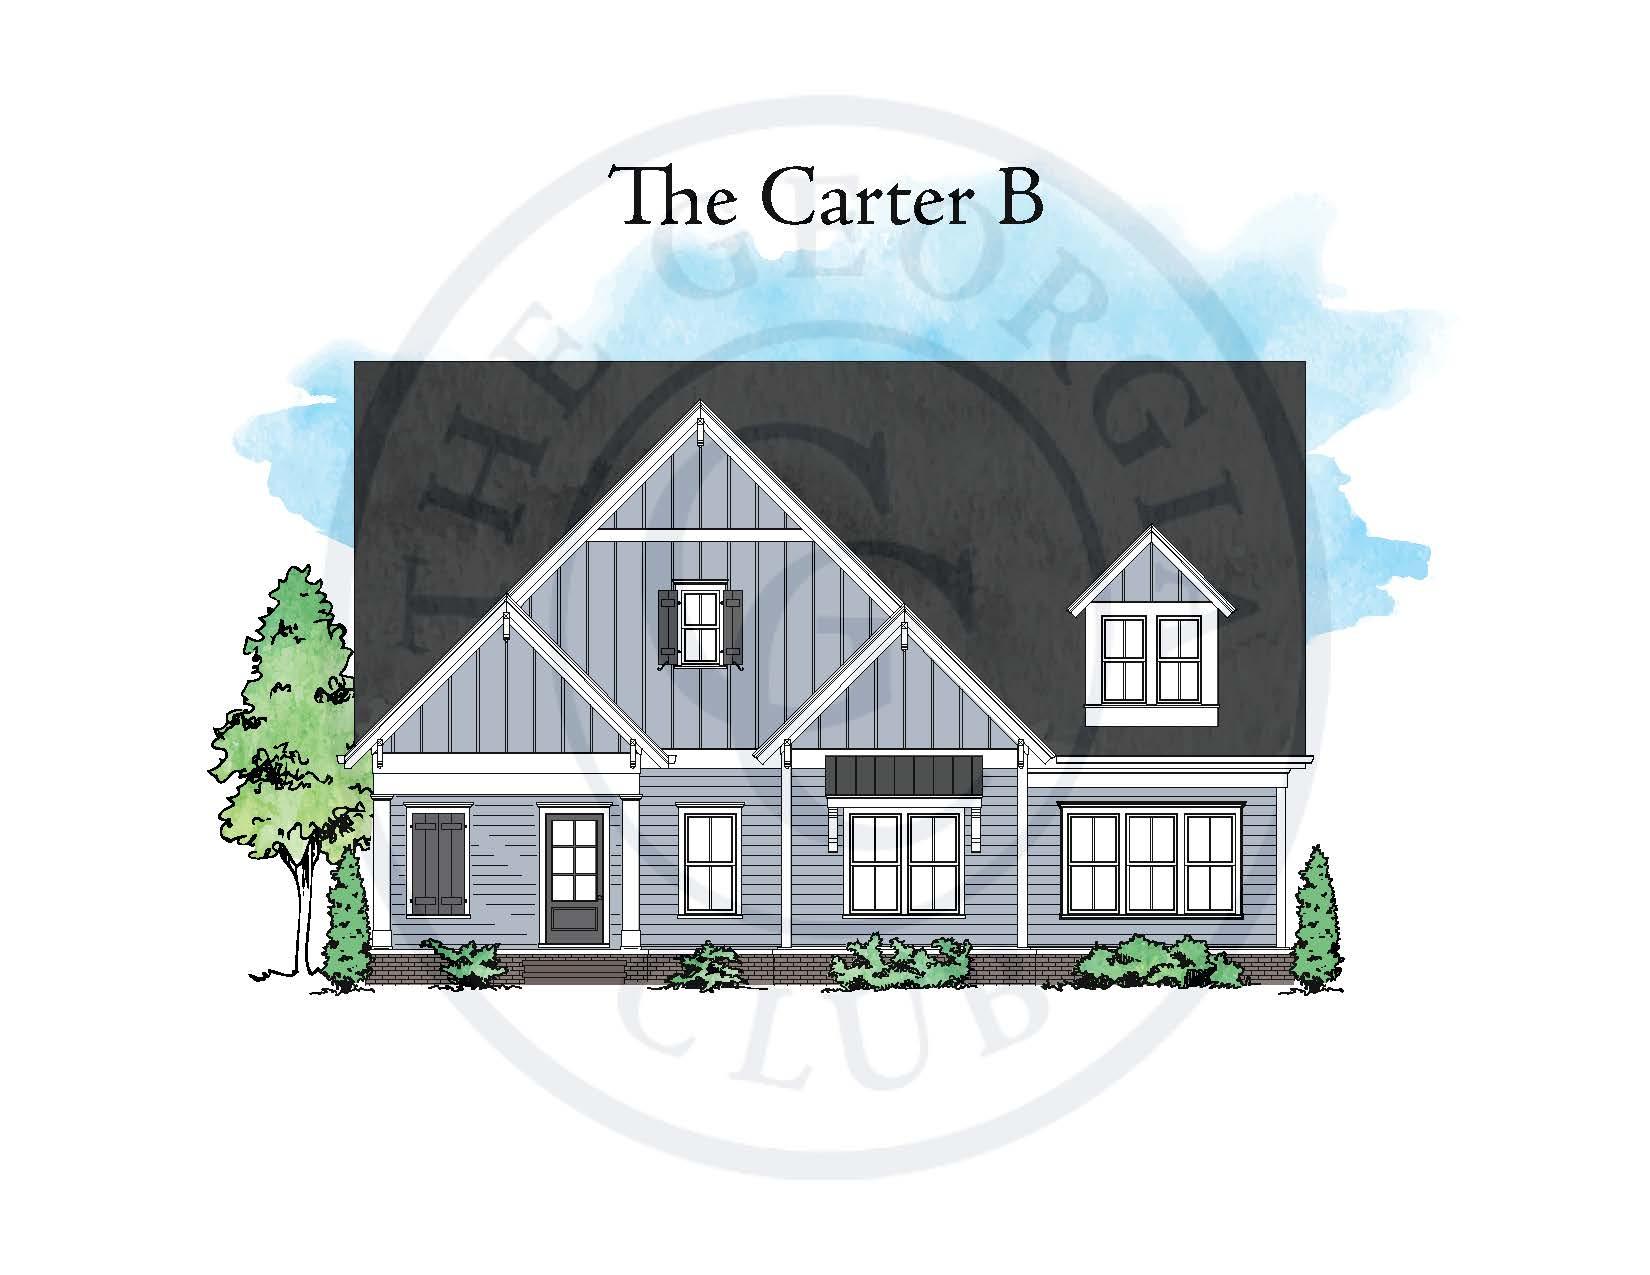 Carter B